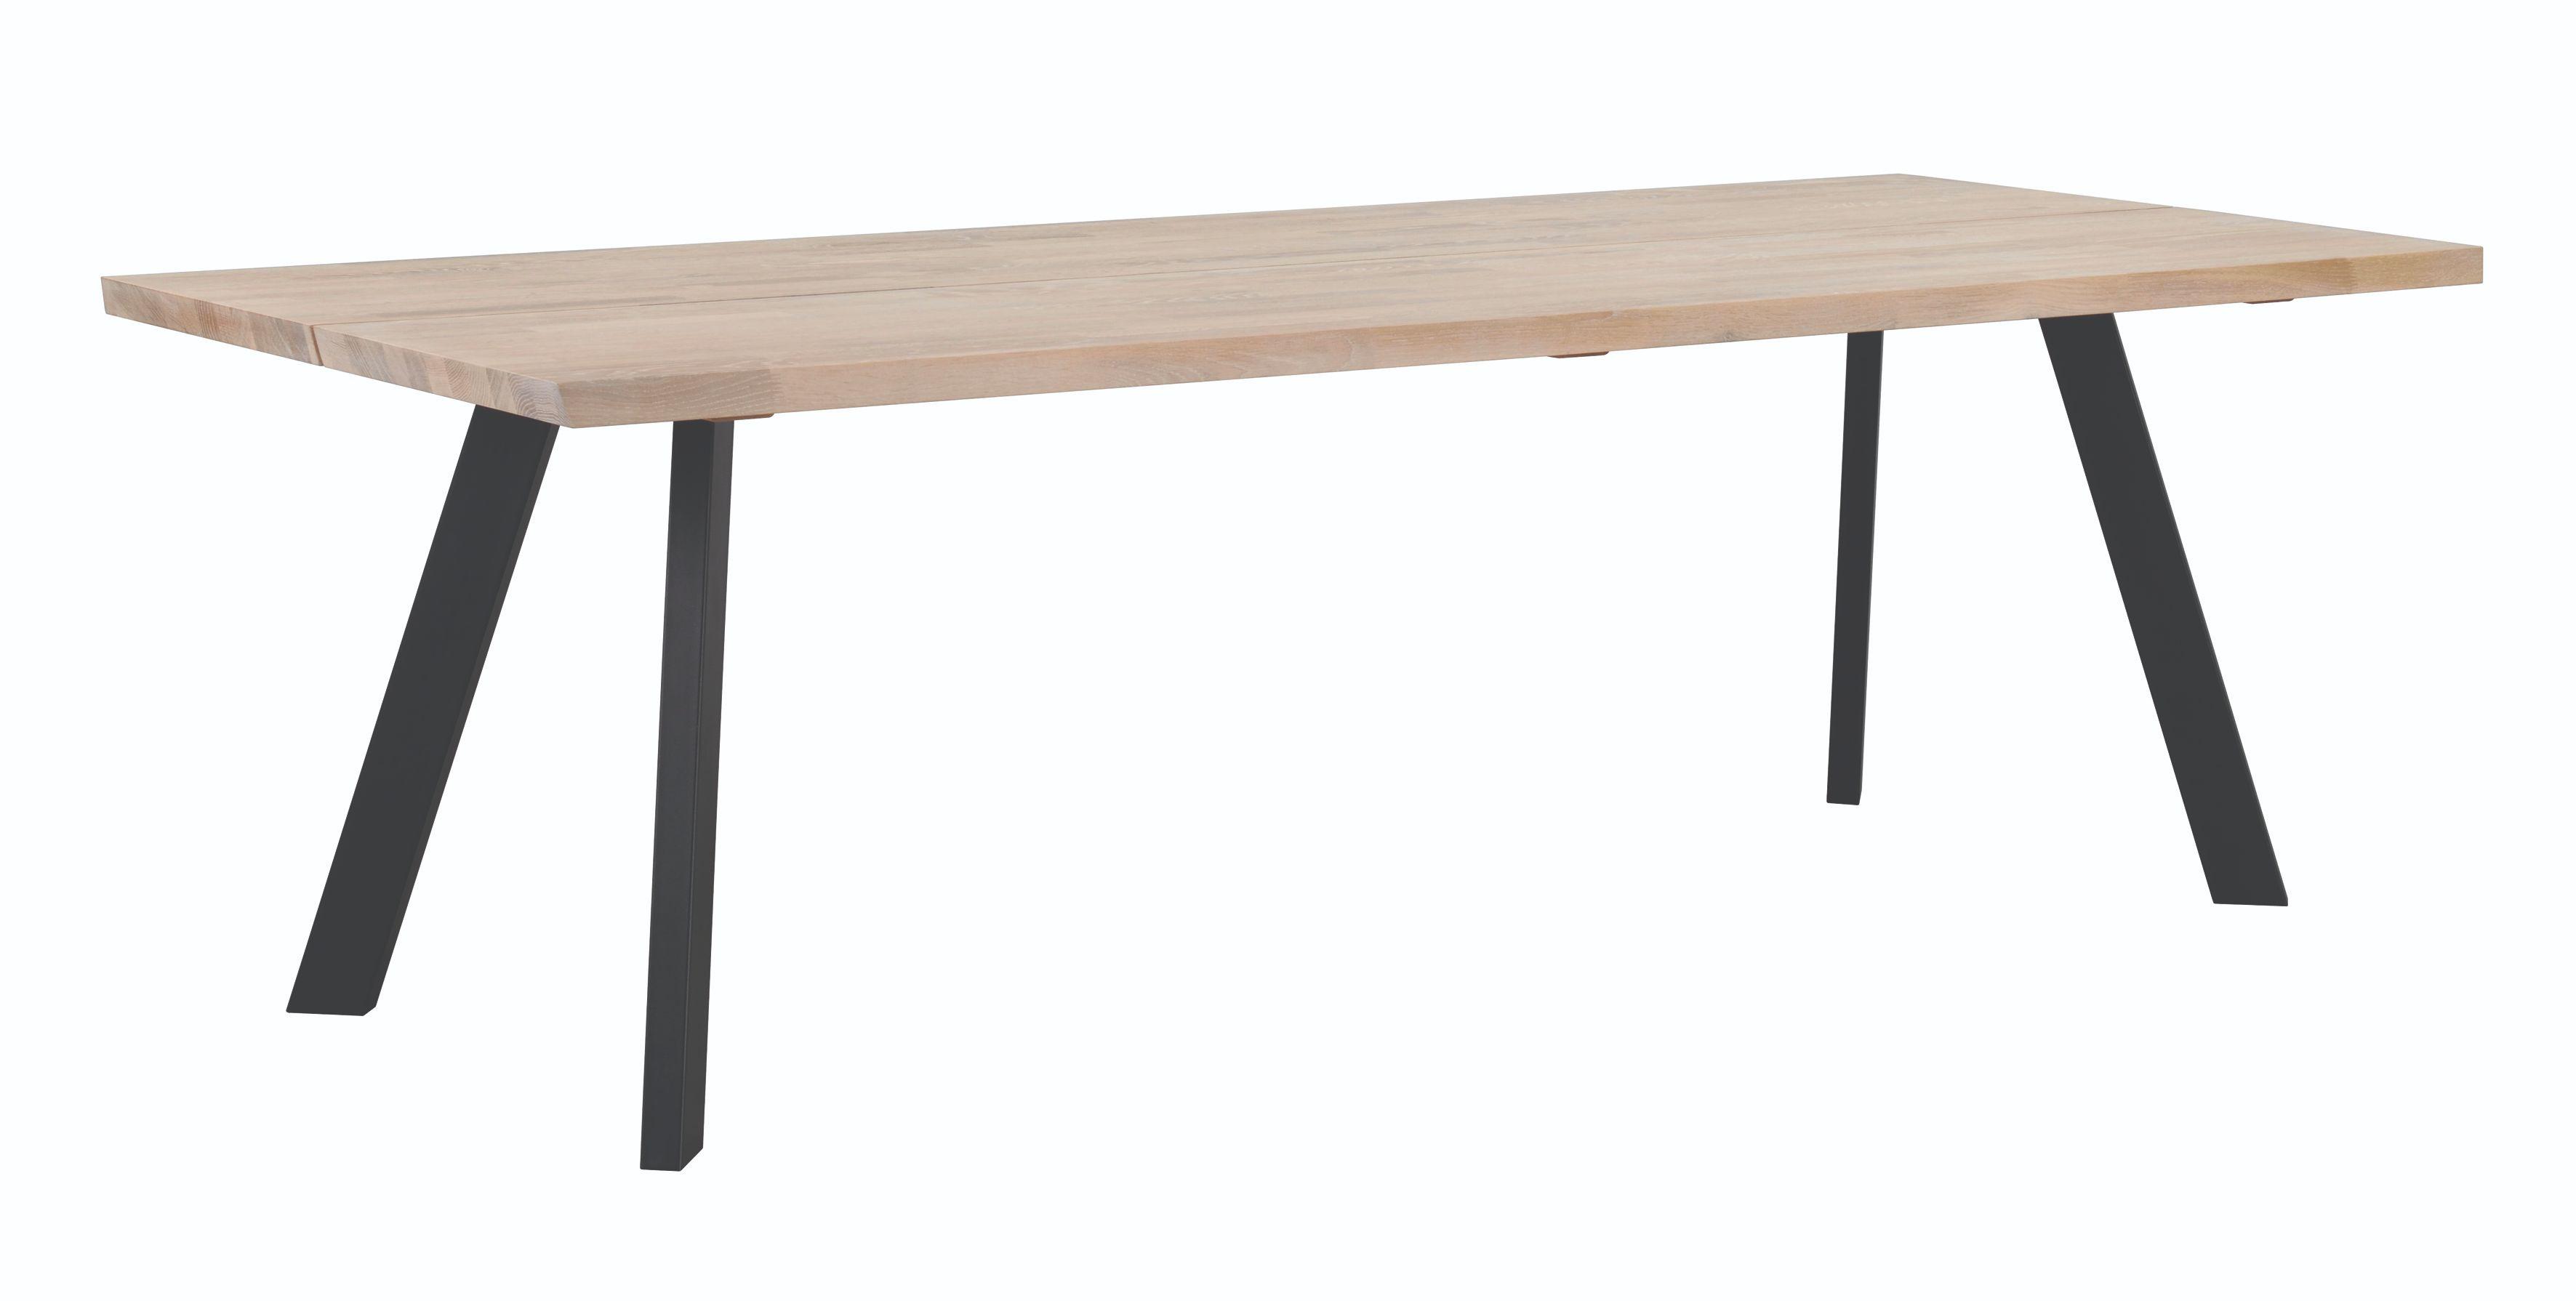 FRED LIGHT OAK 240 cm Dining Table